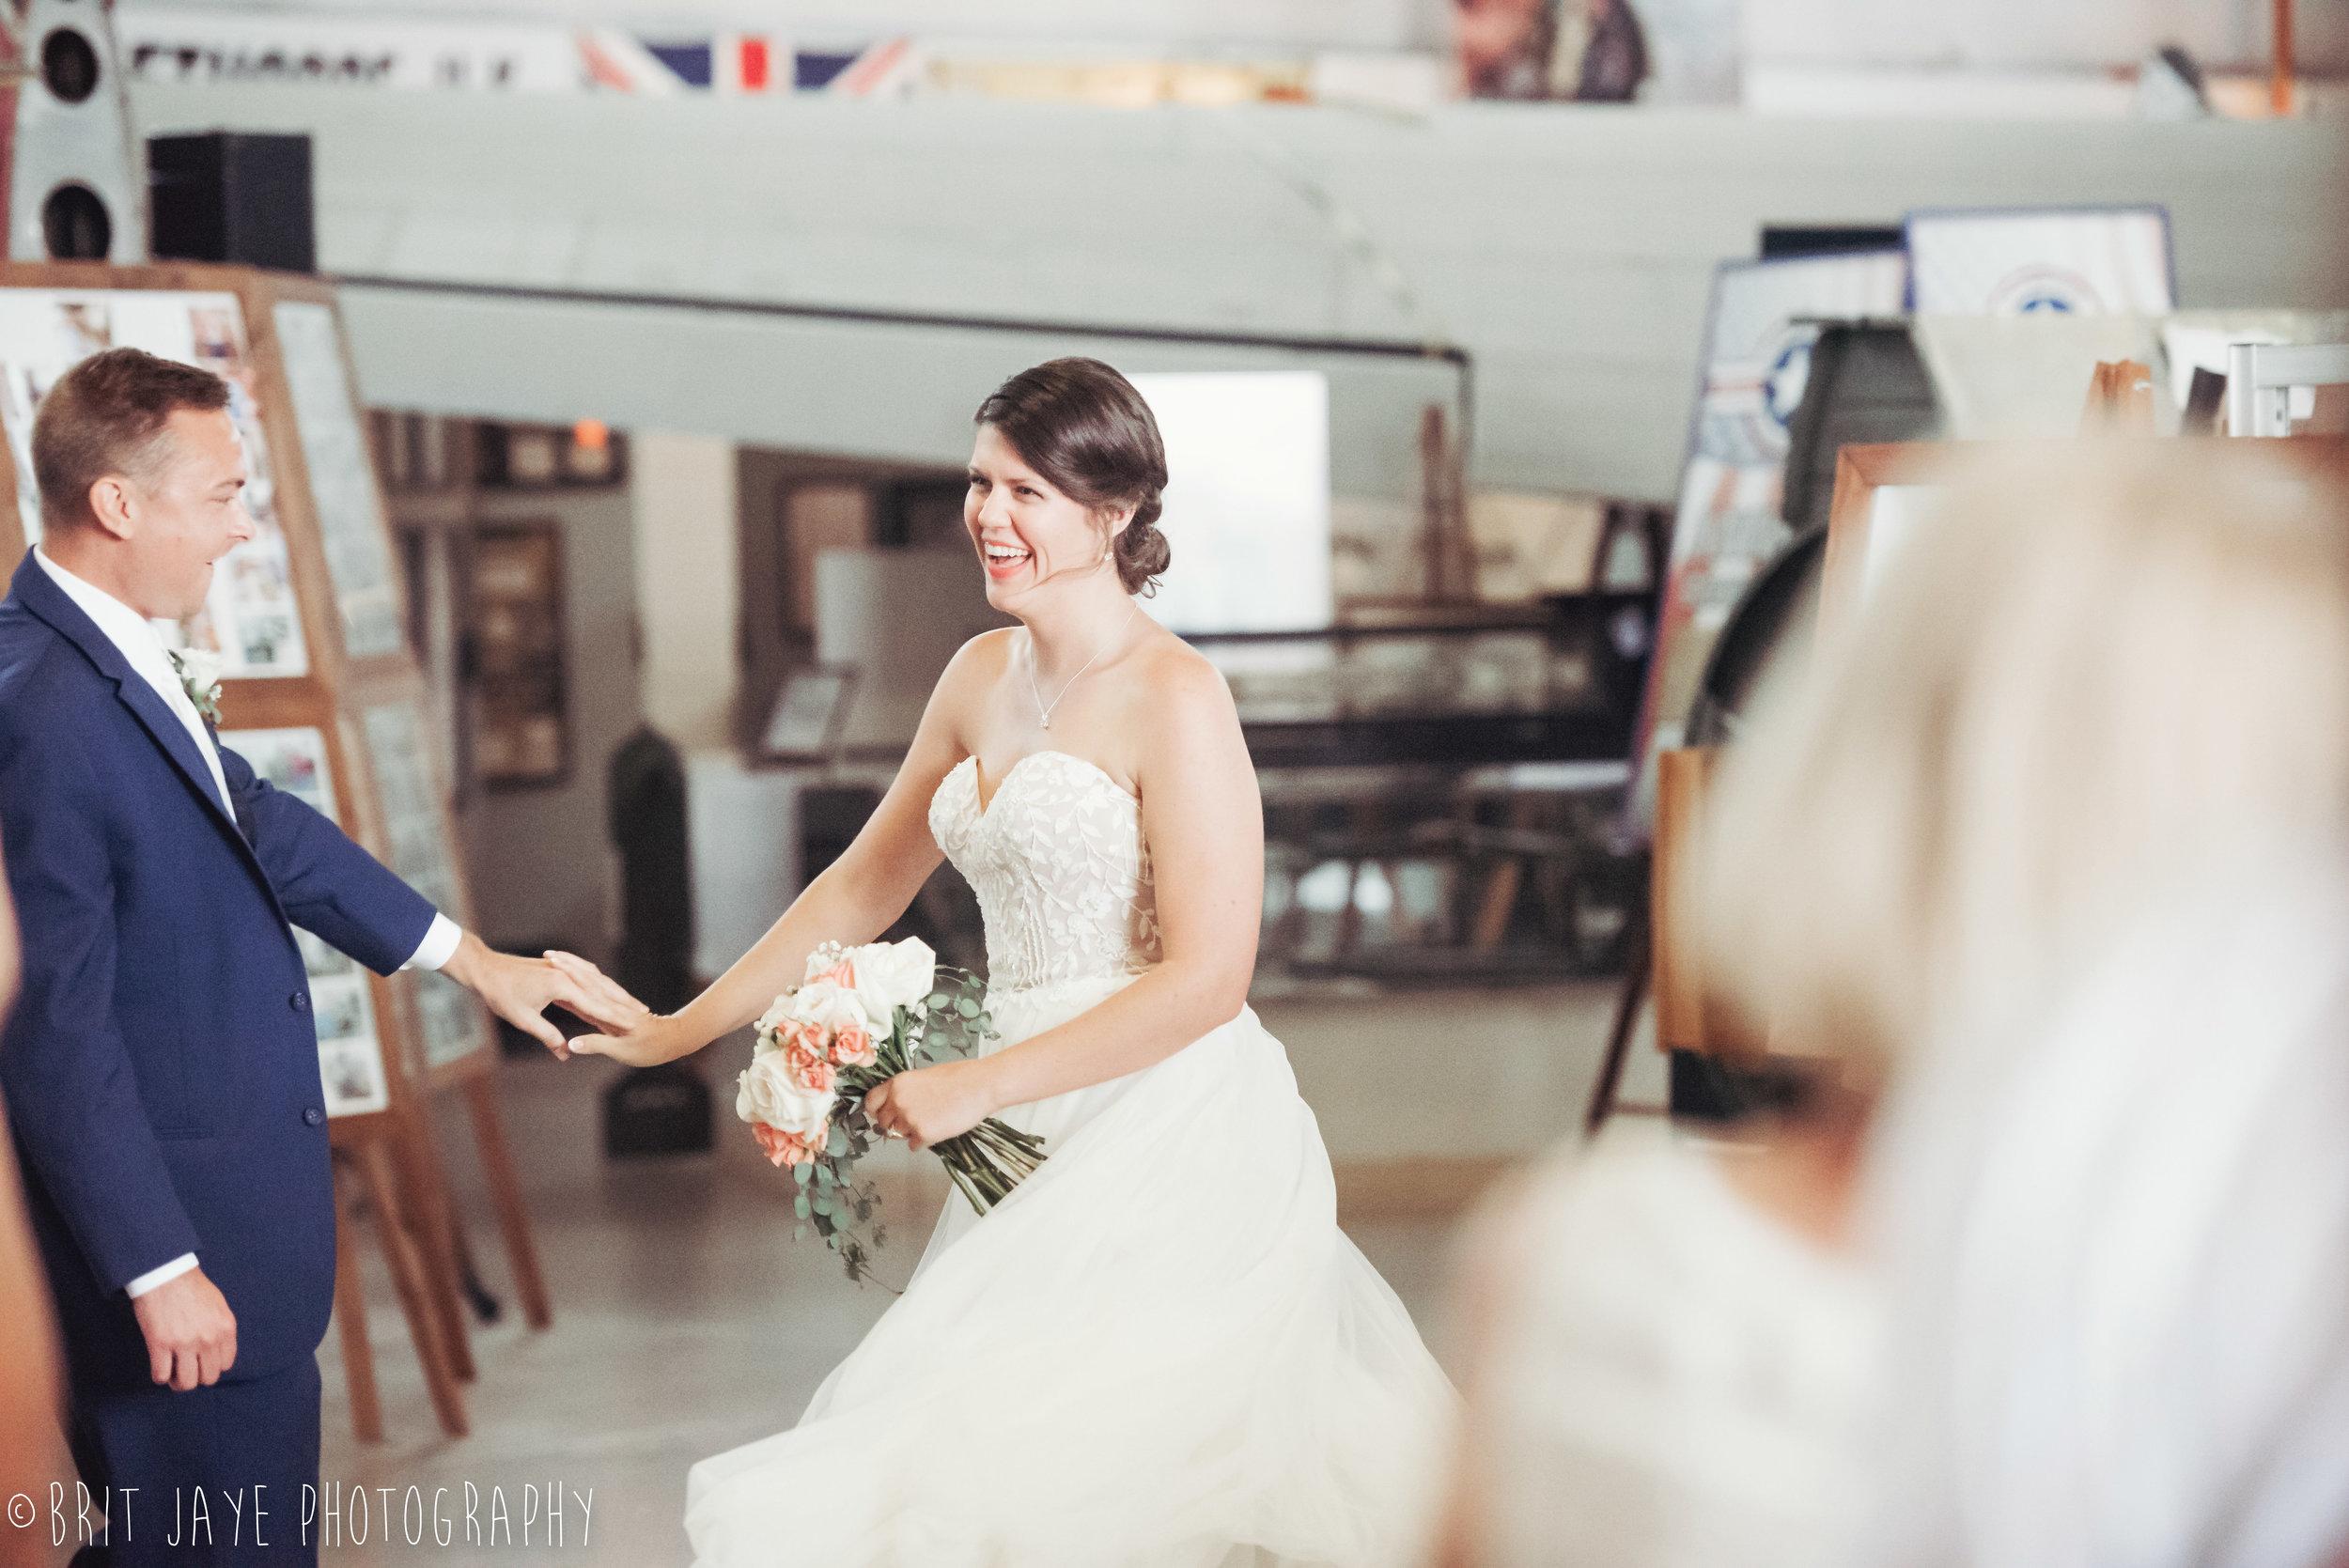 Champaign_aviation_museum_travel_inspired_wedding-76.jpg